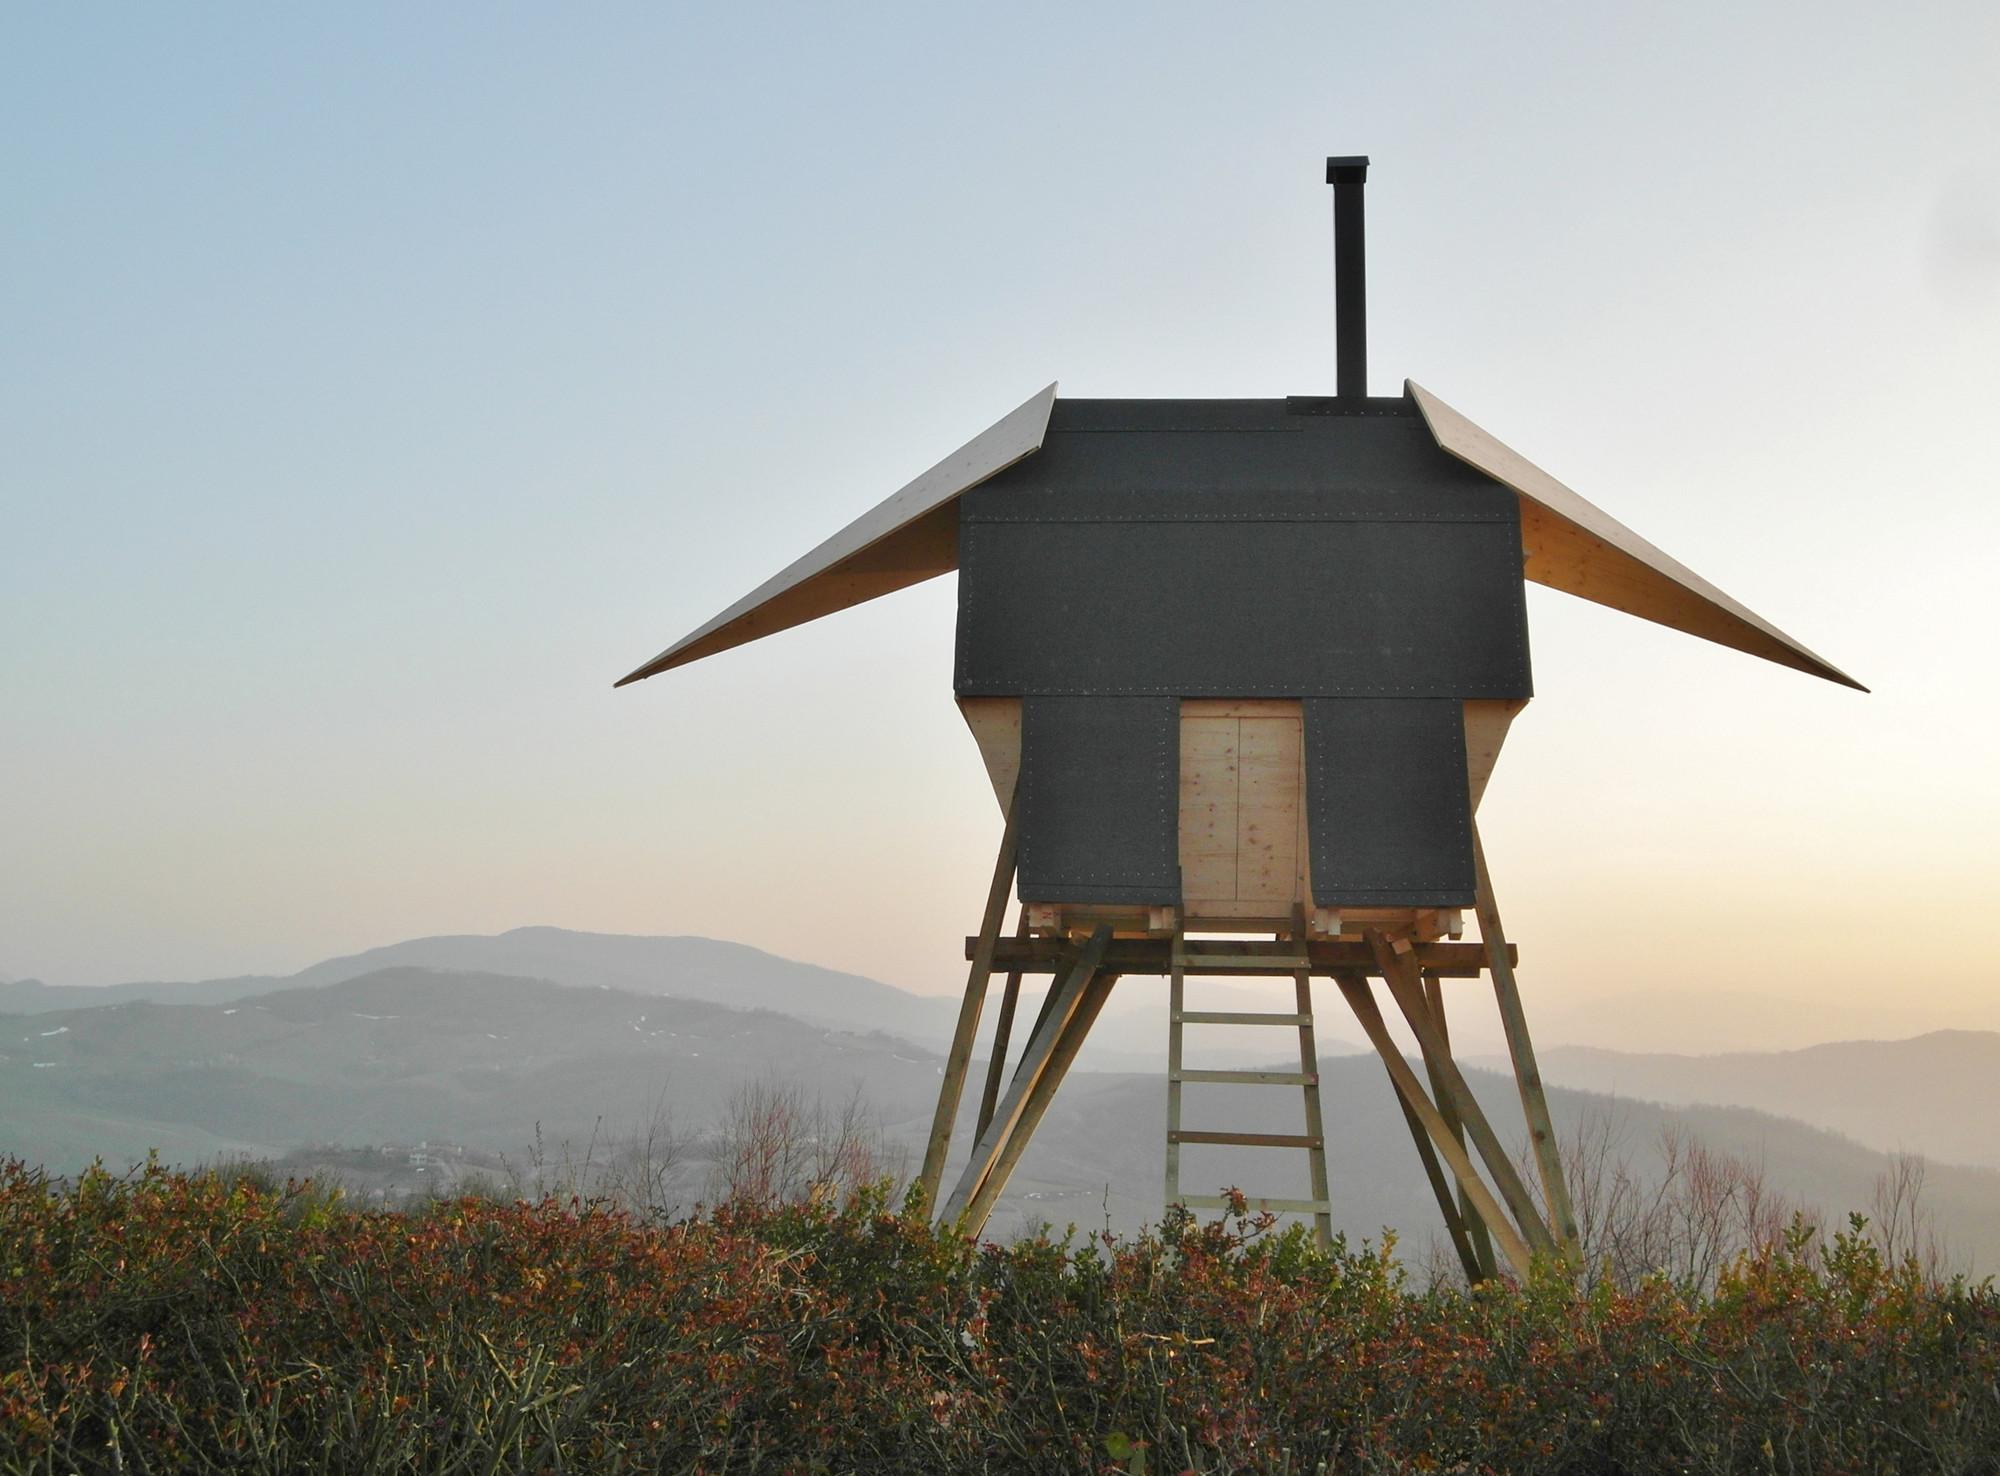 Sauna Huginn & Muninn / AtelierFORTE, Courtesy of AtelierFORTE